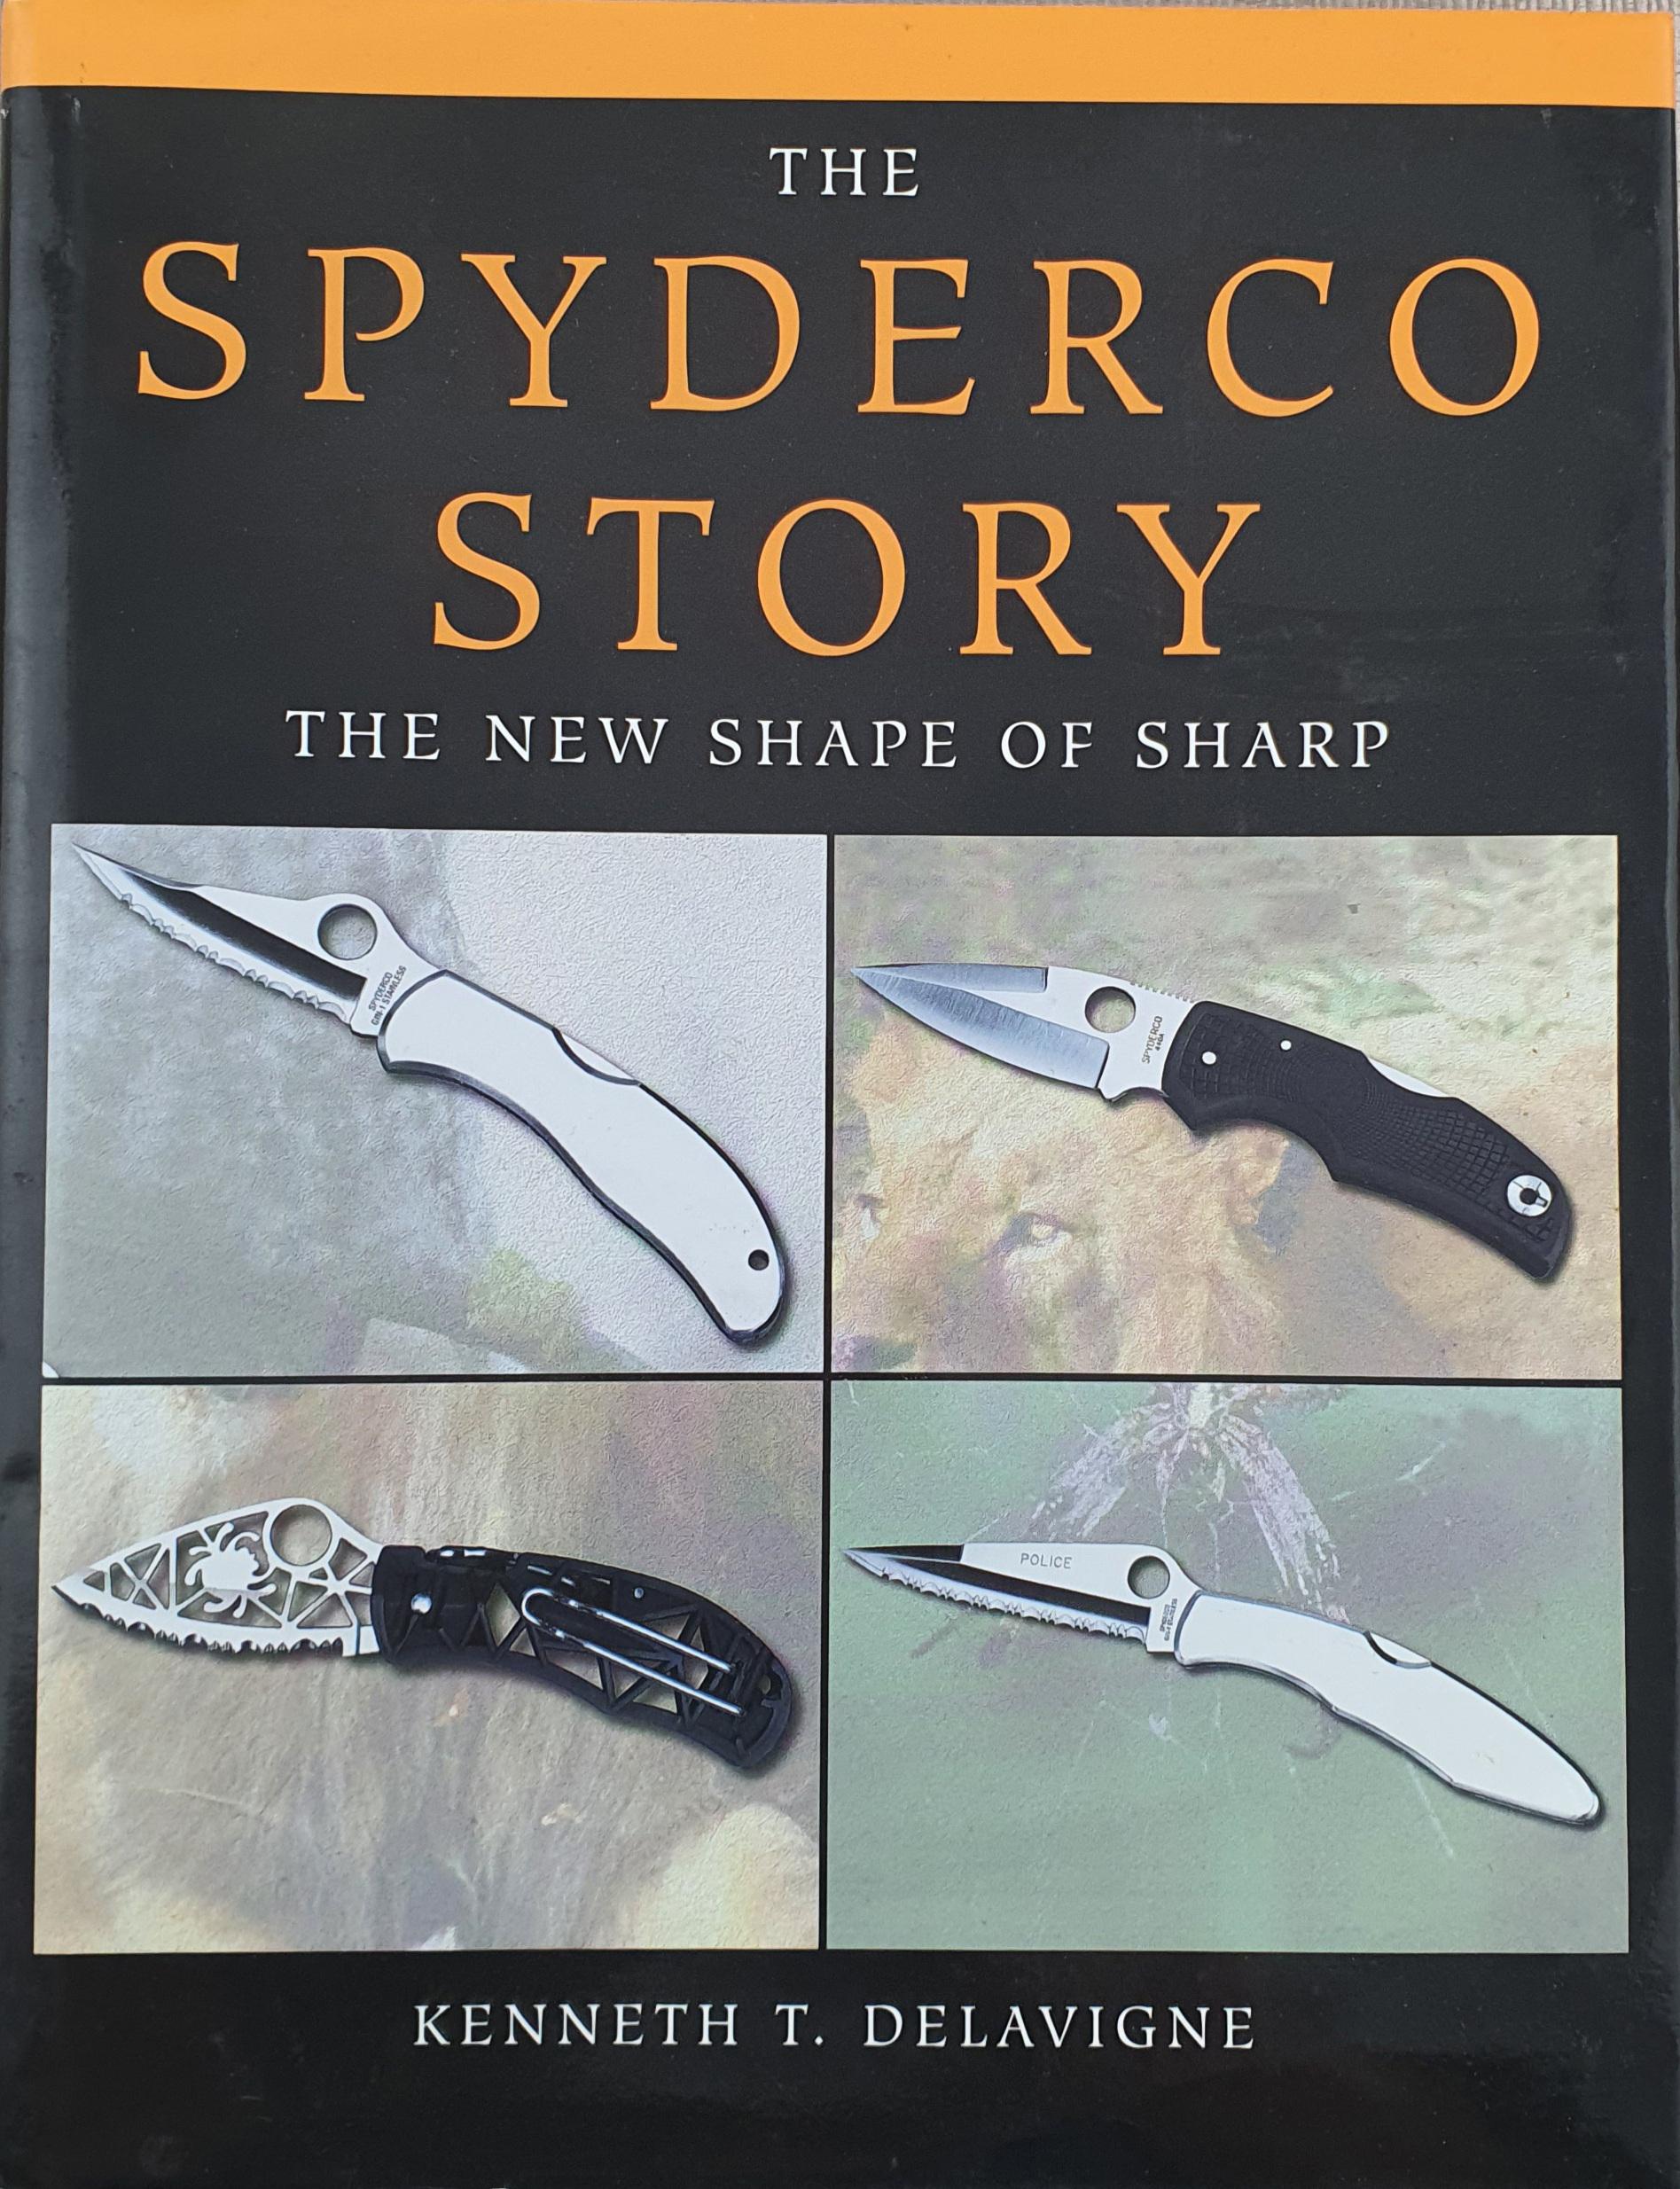 Spyderco Story